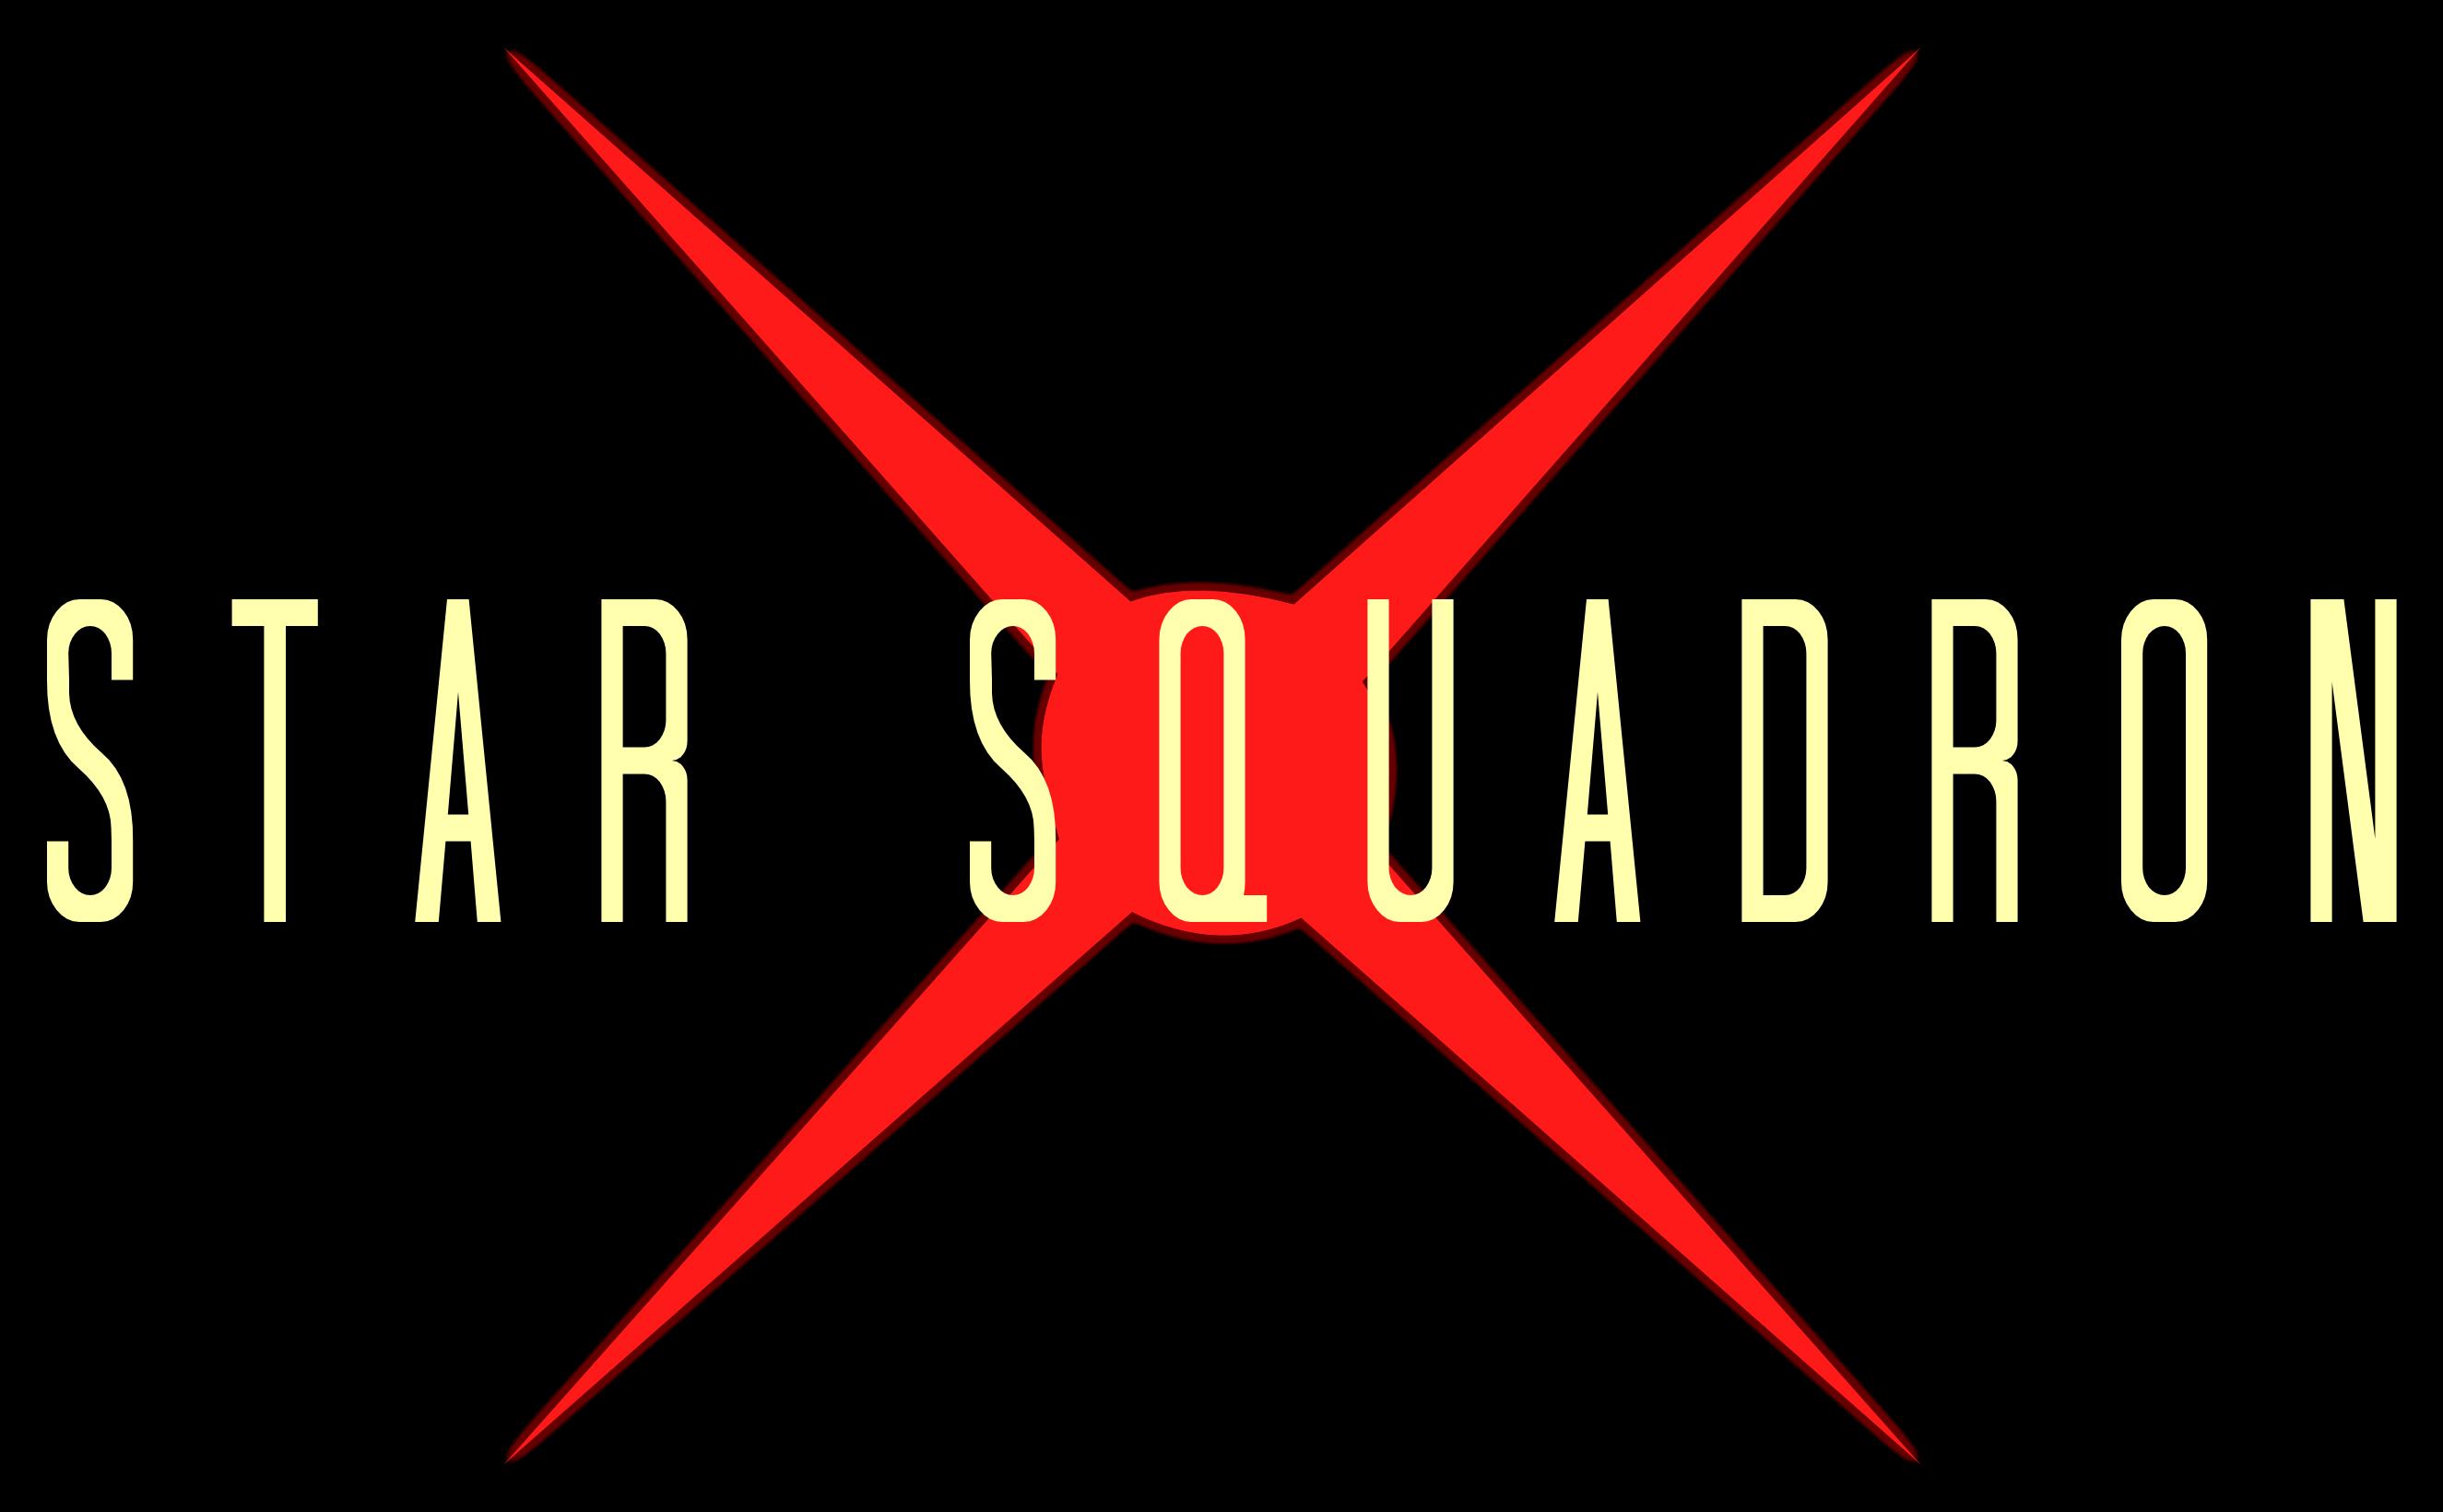 Star Squadron